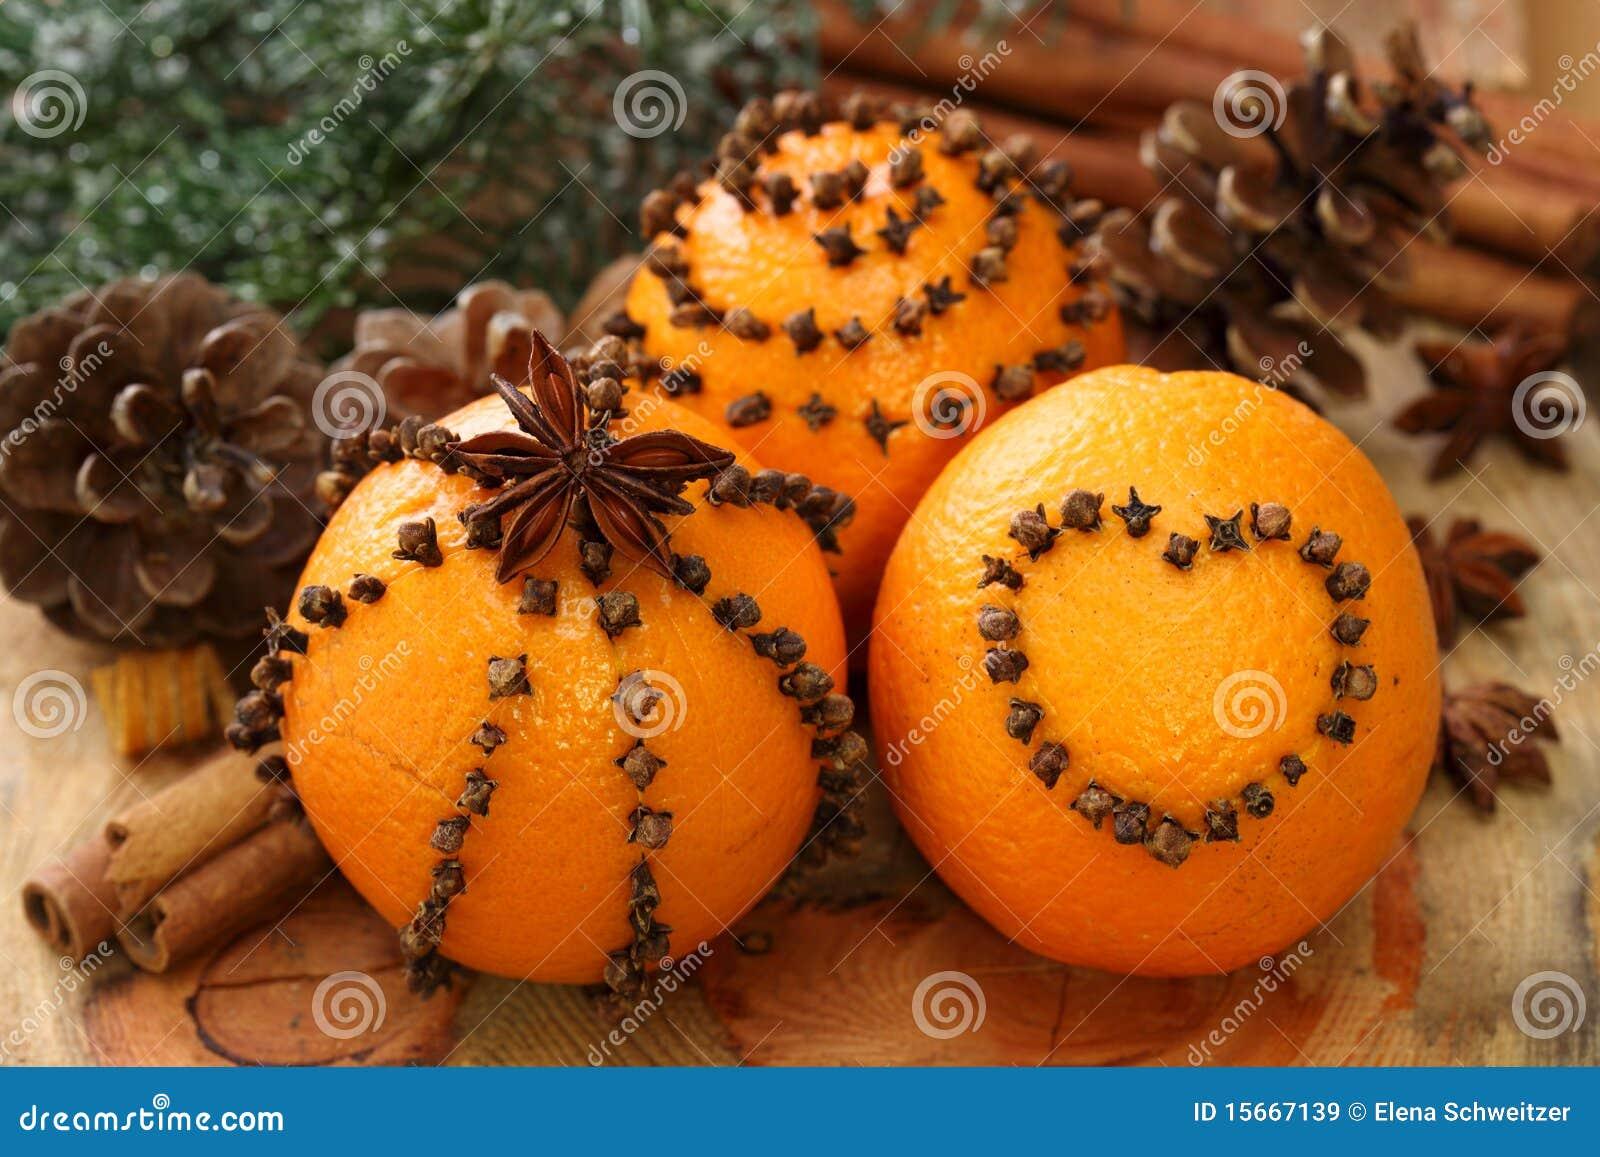 Sinaasappelen en kruidnagels